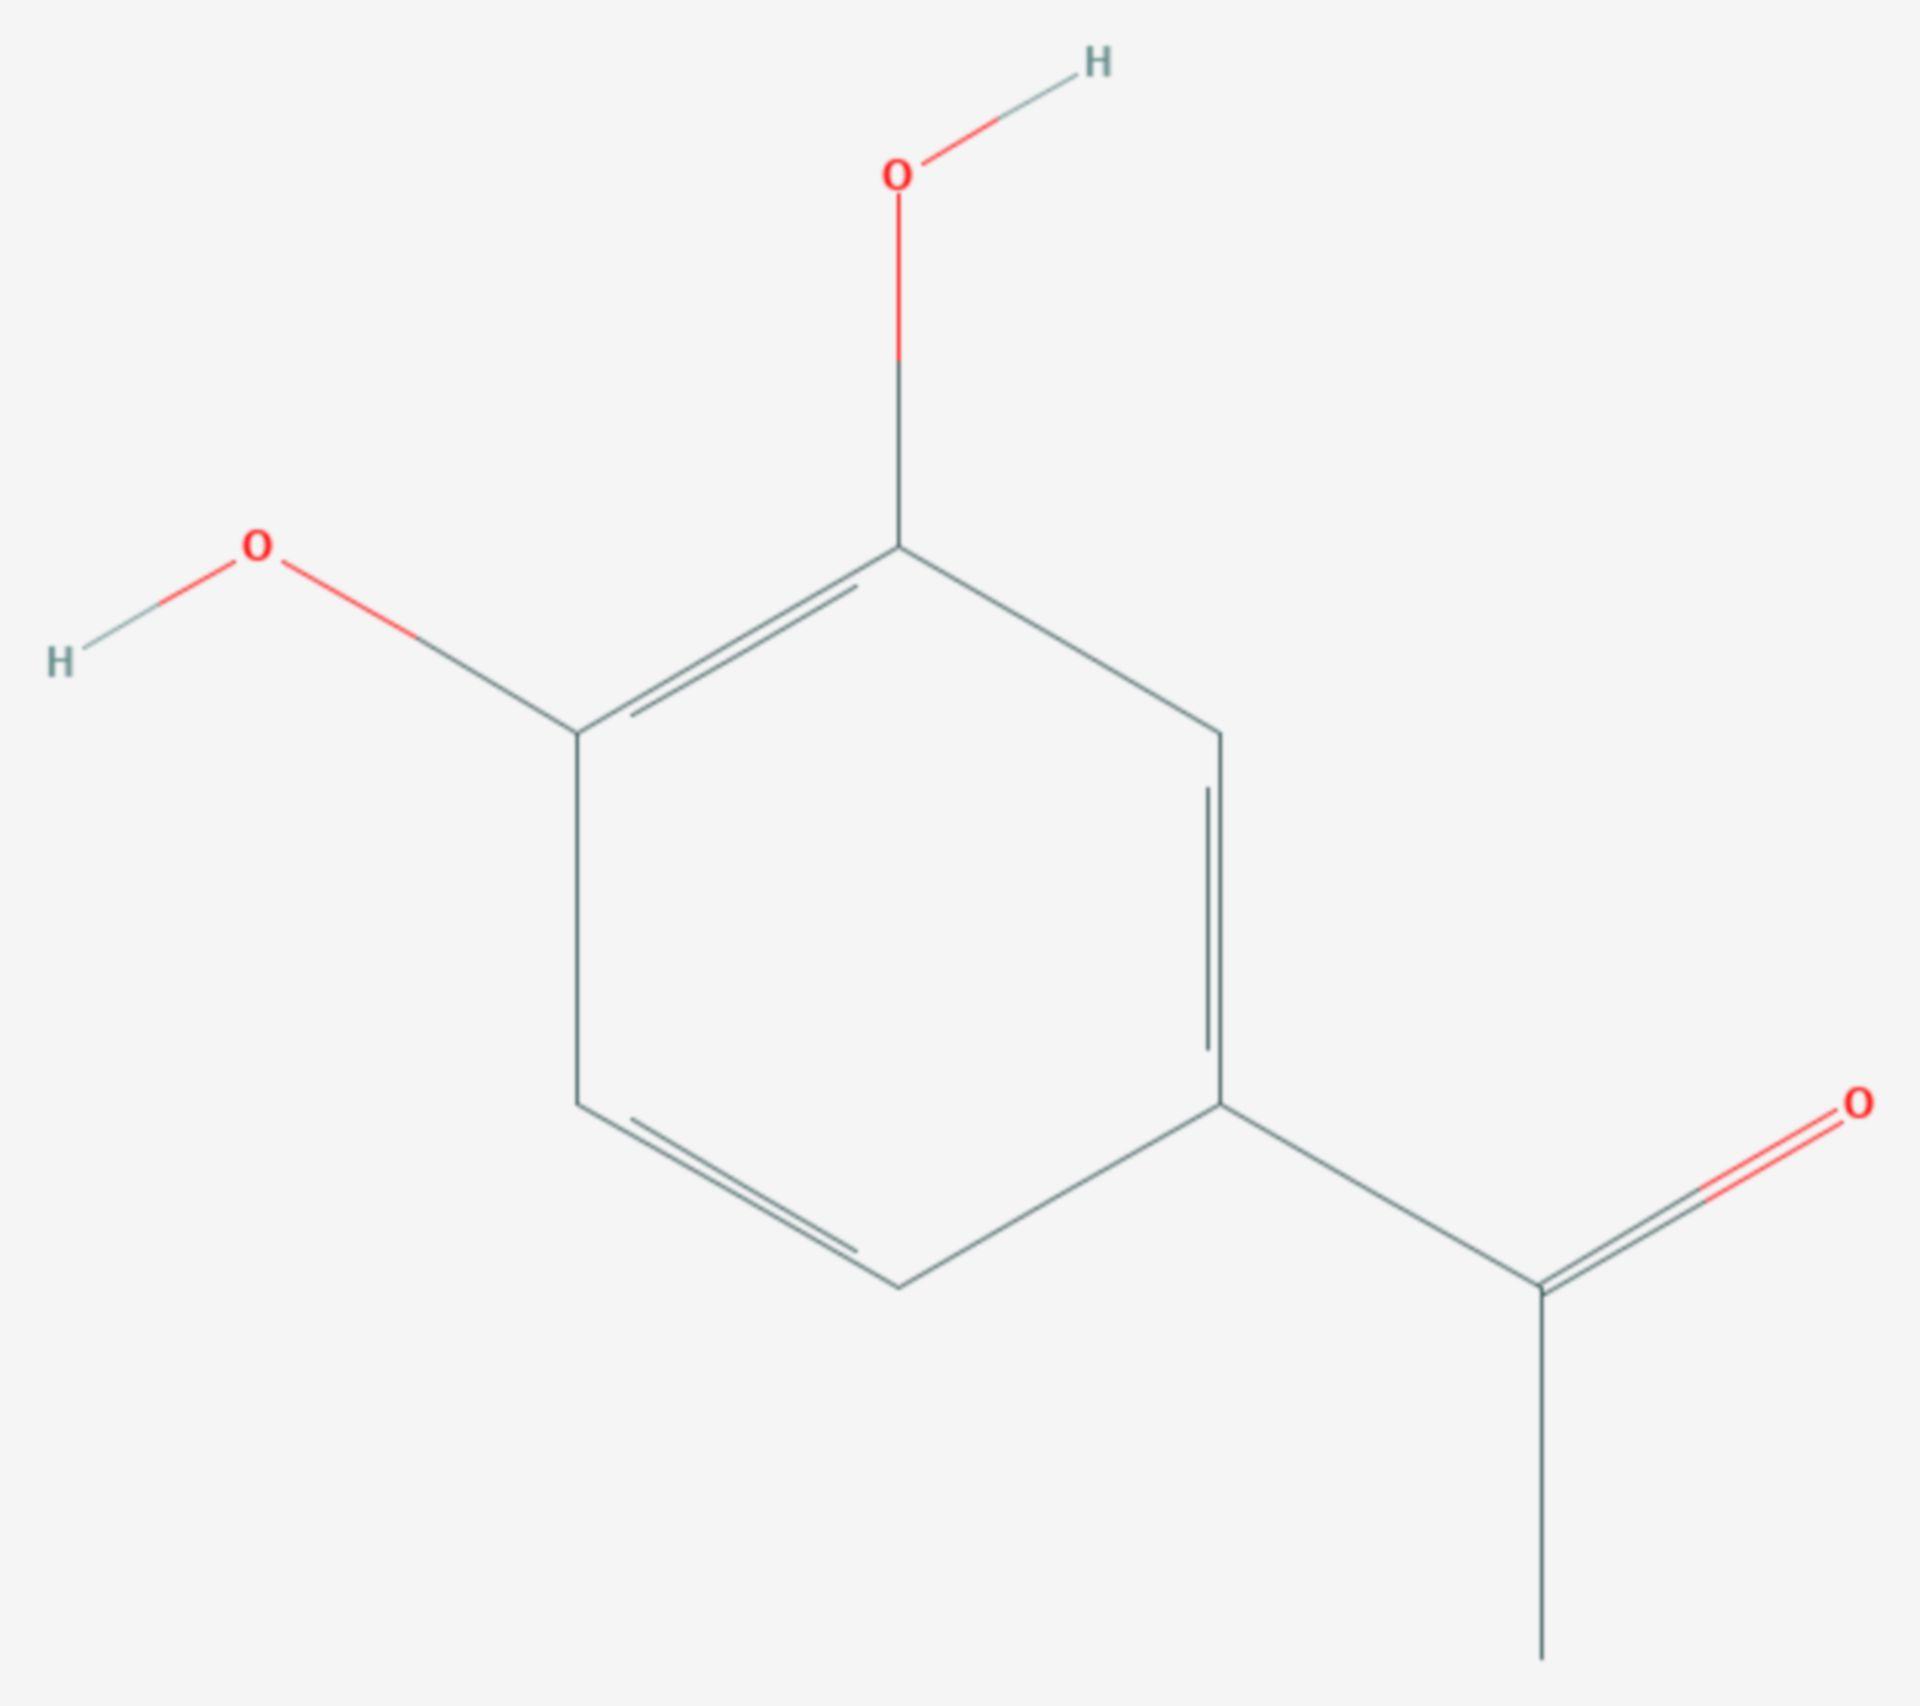 3,4-Dihydroxyacetophenon (Strukturformel)